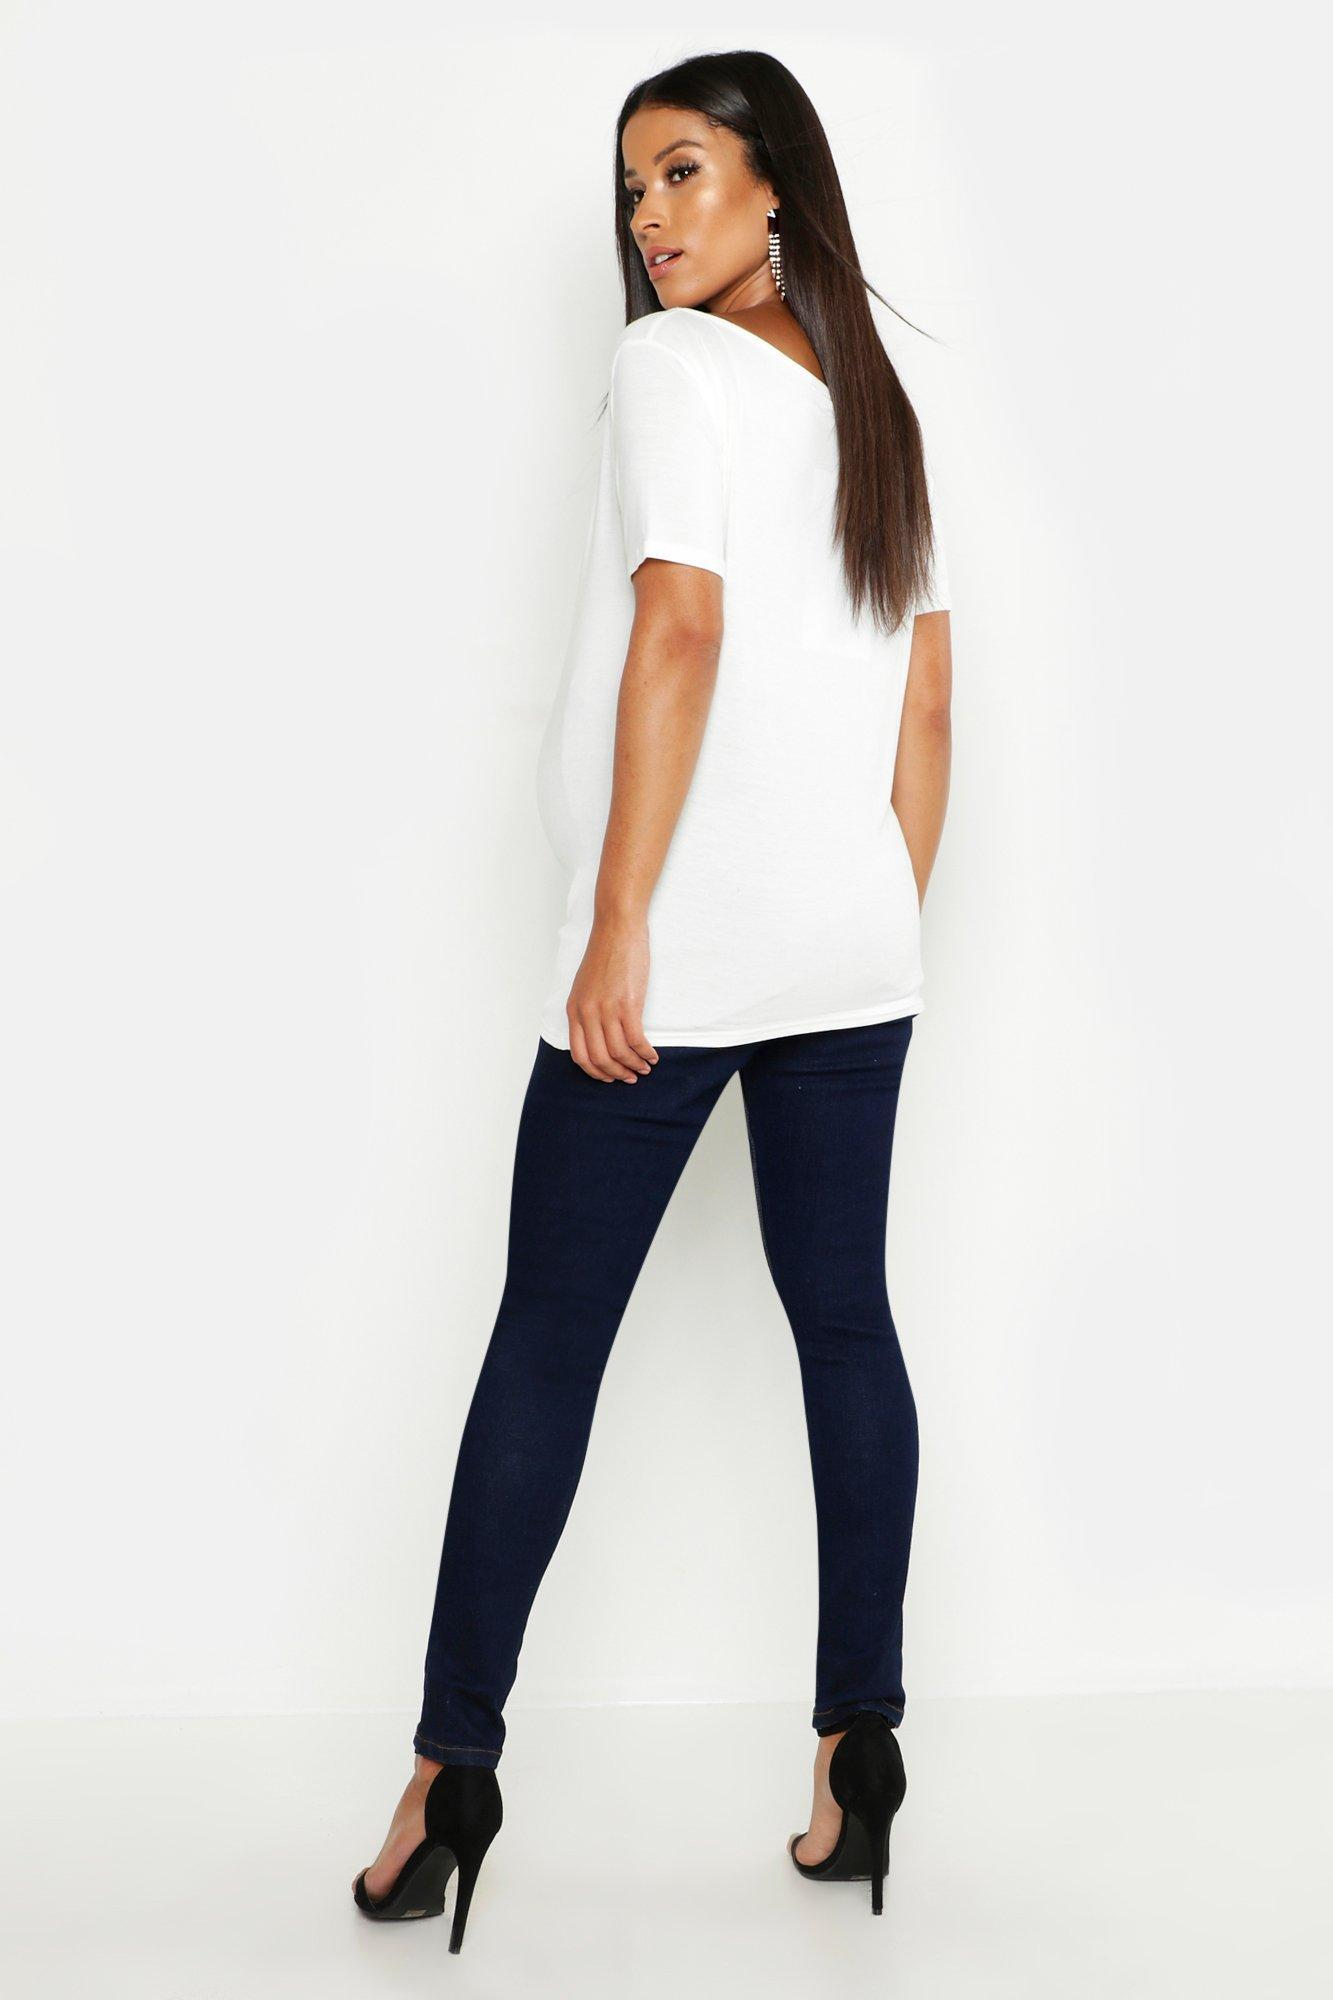 b2166264ab3a6 Boohoo - Blue Maternity Over The Bump Skinny Super Stretch Jean - Lyst.  View fullscreen